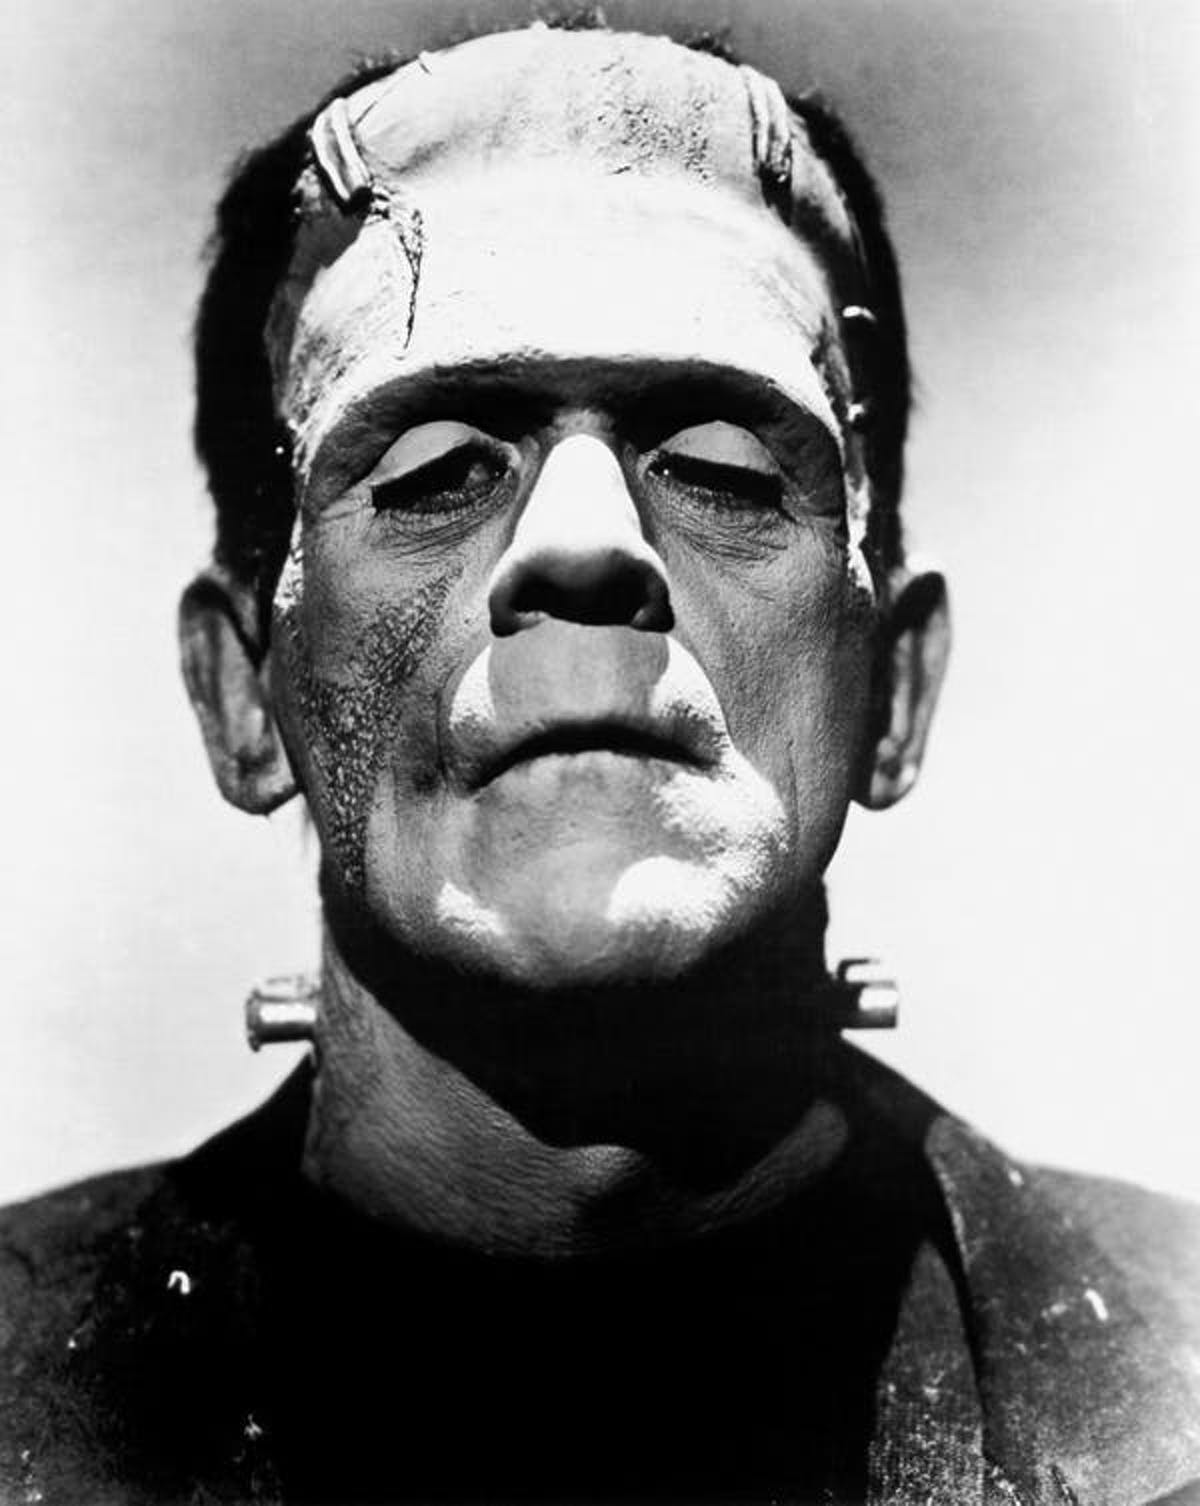 Boris Karloff plays Frankenstein's monster, 1935.